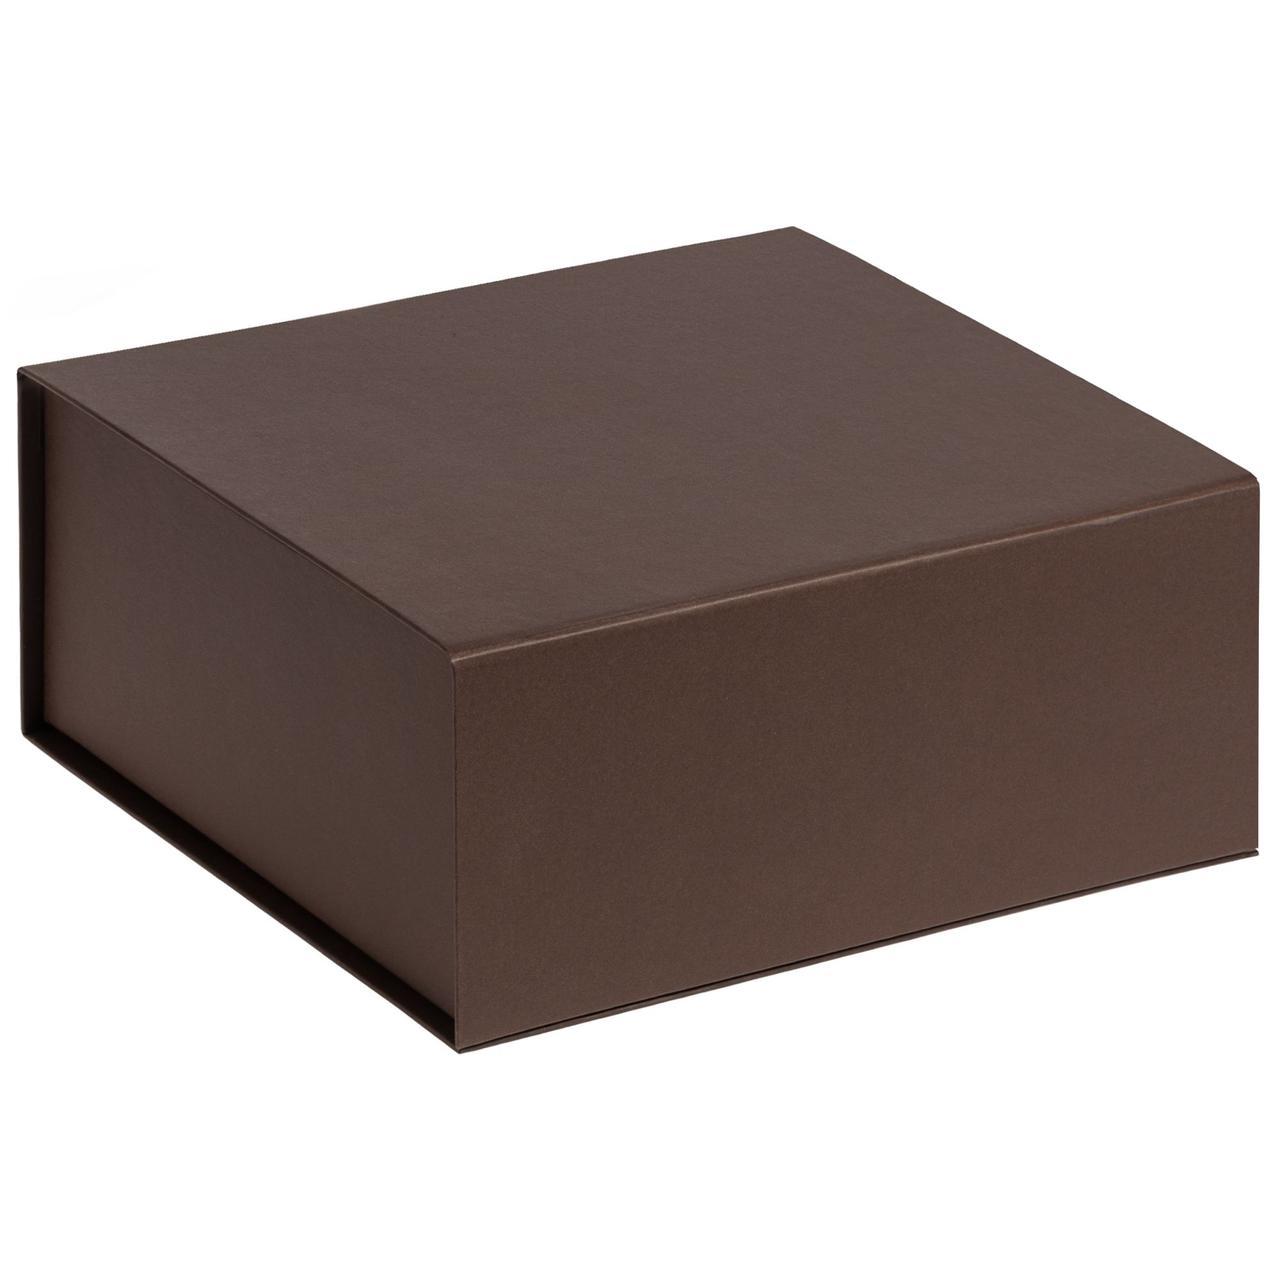 Коробка Amaze, коричневая (артикул 7586.55)